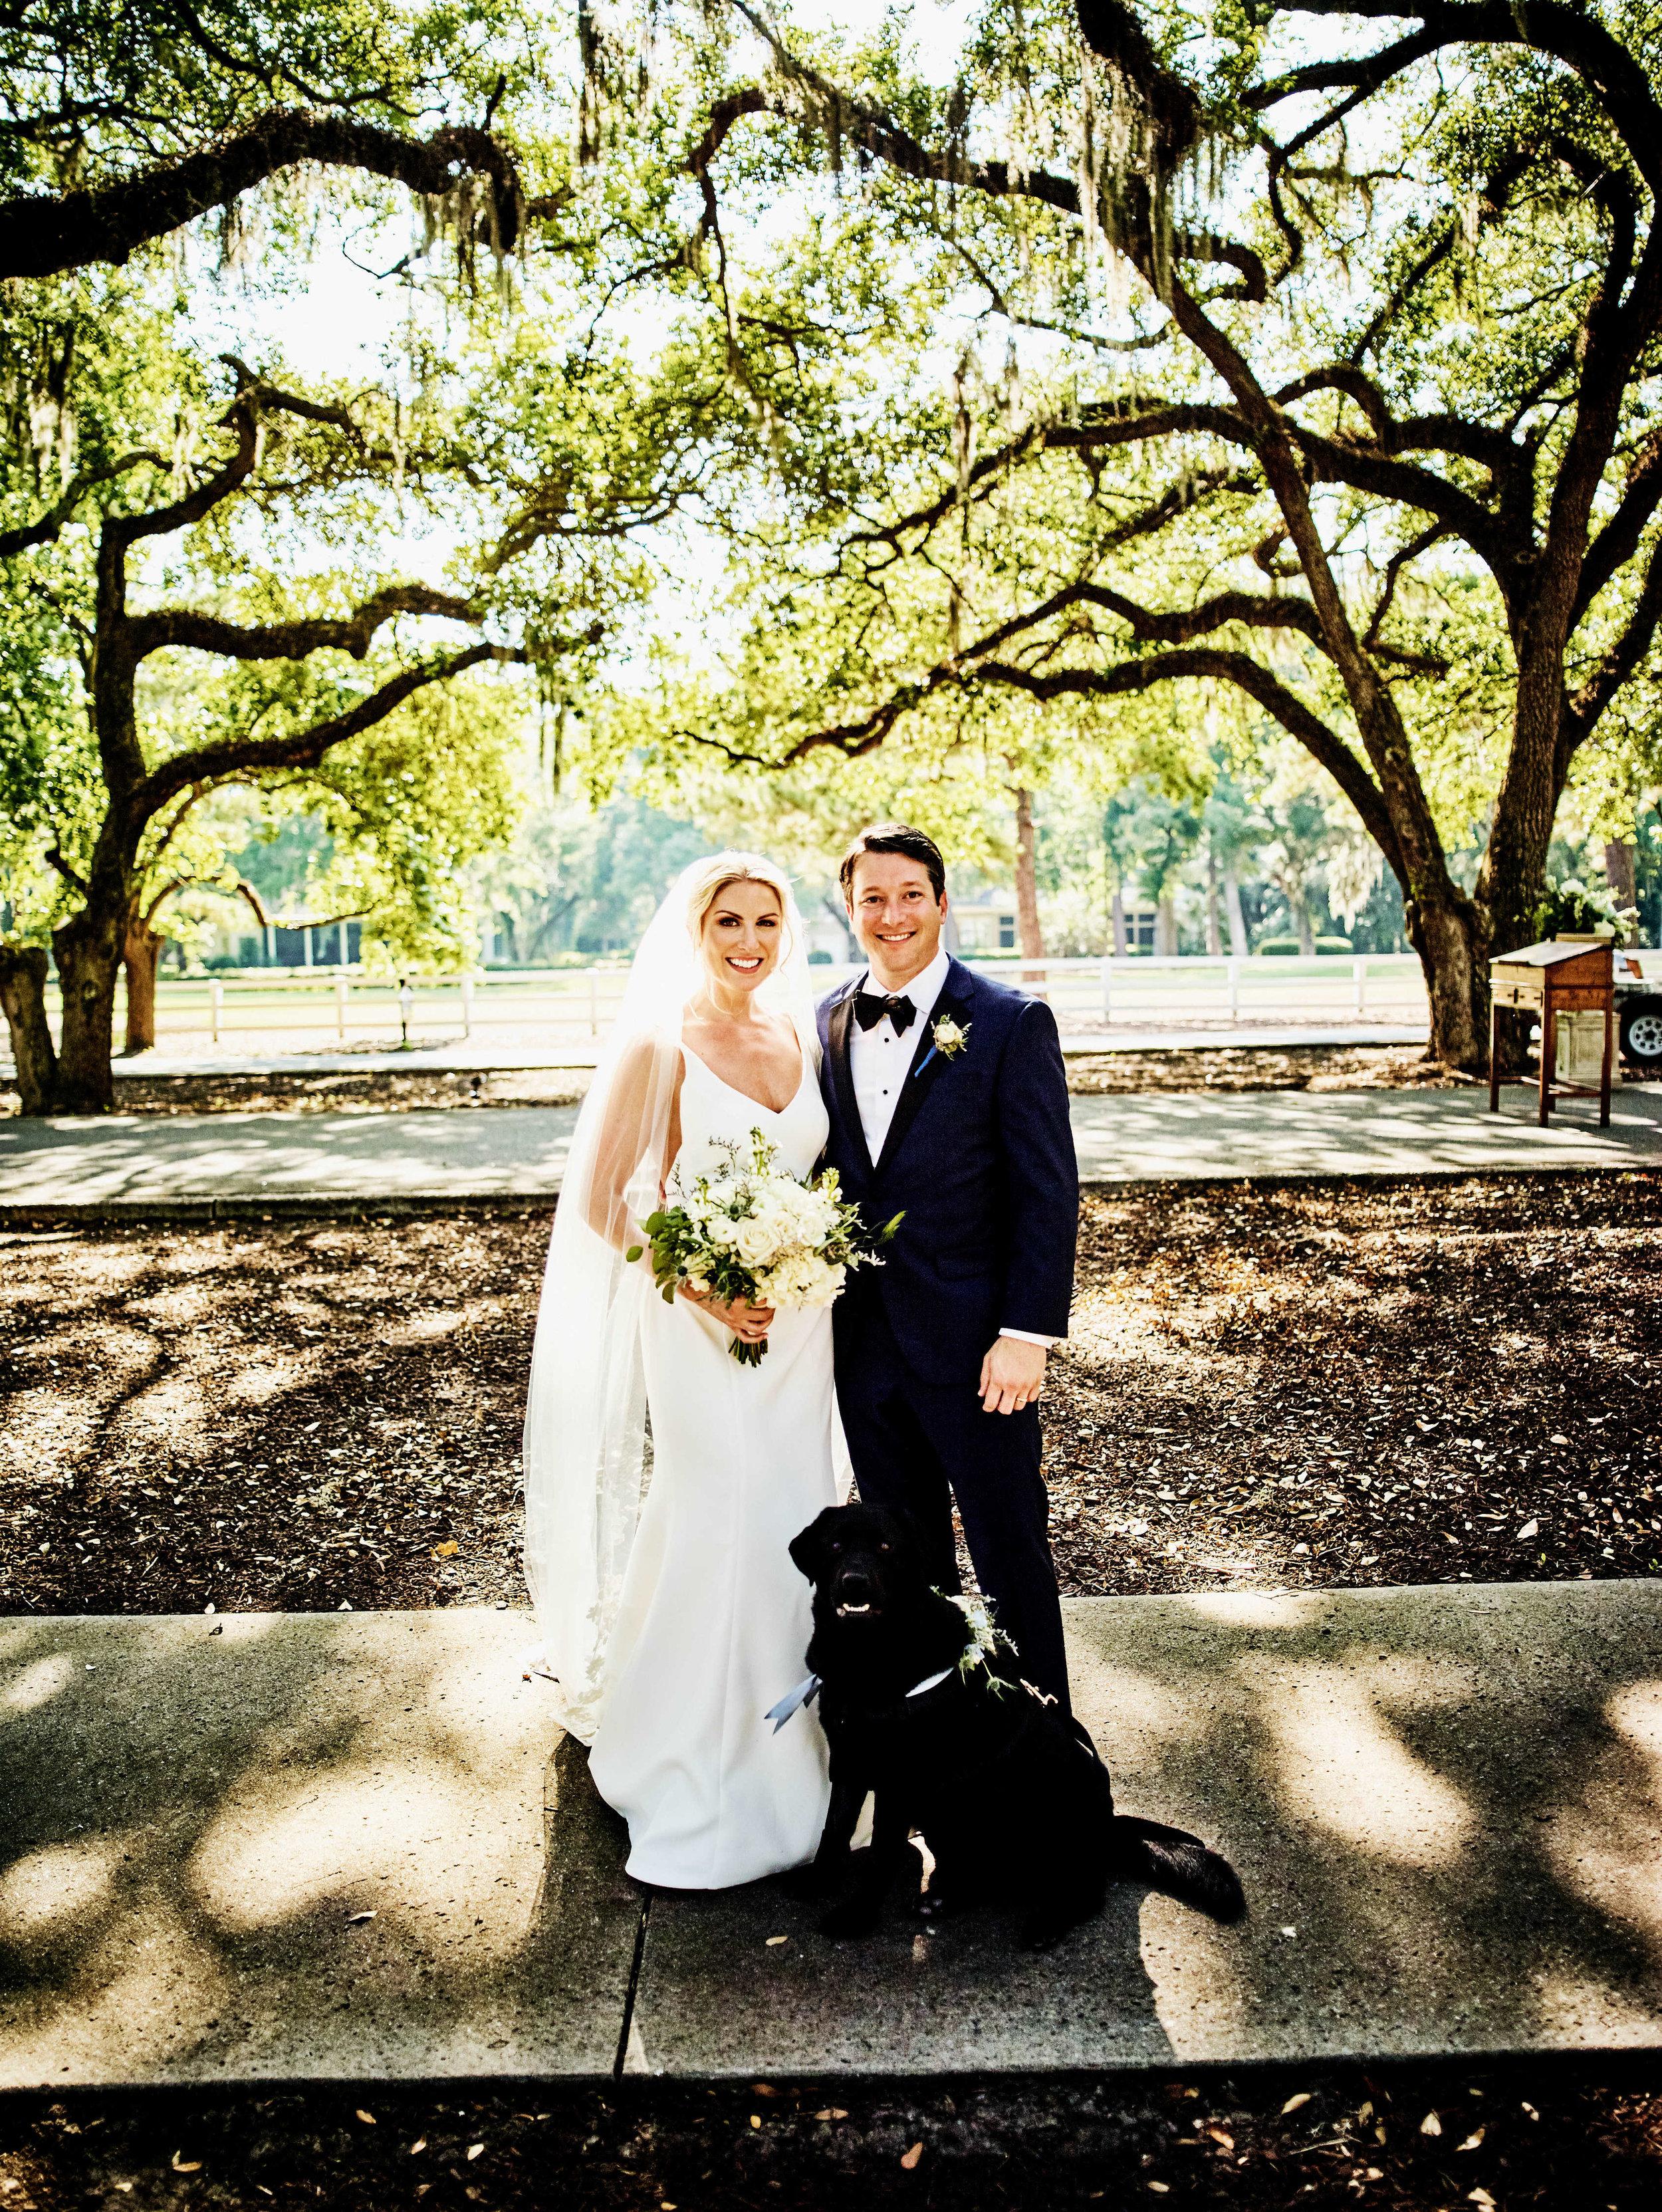 annie-and-greg-weding-belfair-plantation-ivory-and-beau-savannah-wedding-savannah-wedding-planner-classic-timeless-bride-groom-dog-belfair-plantation.jpg